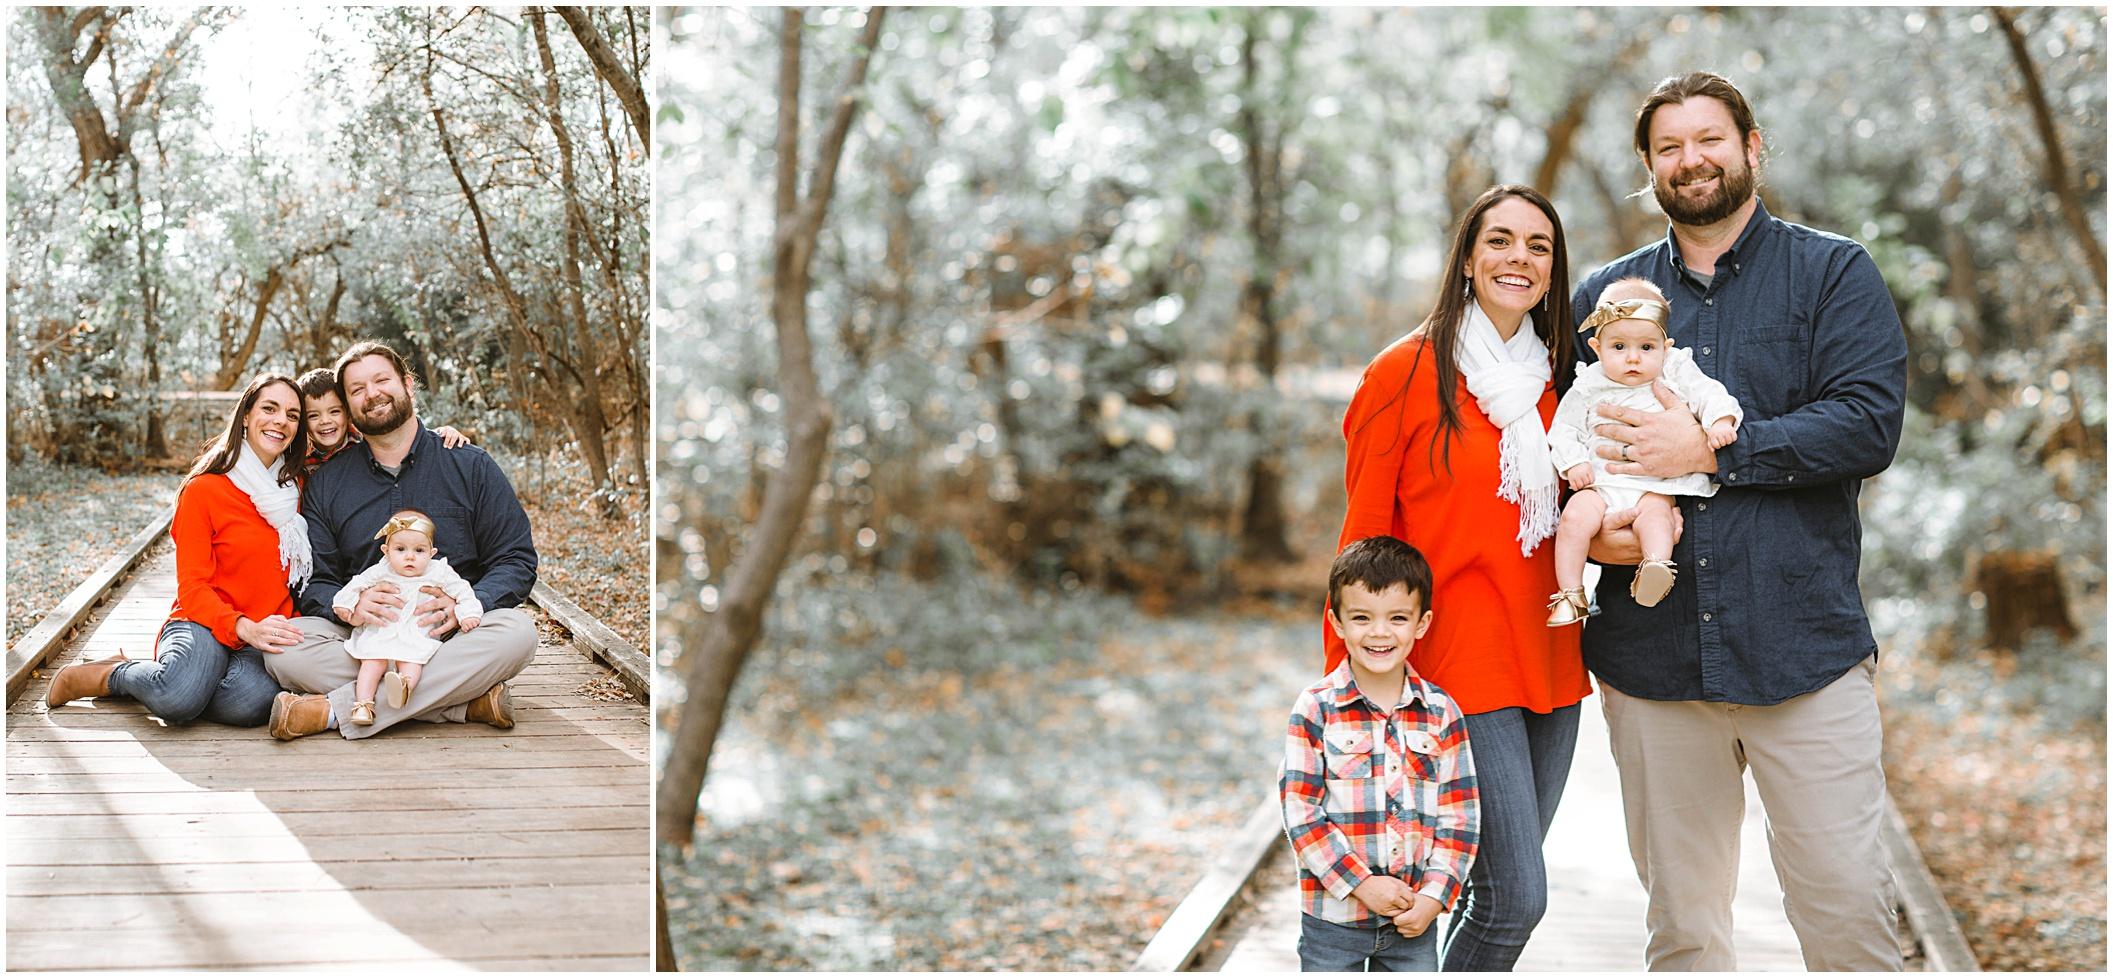 Austin Family Photographer_0164.jpg